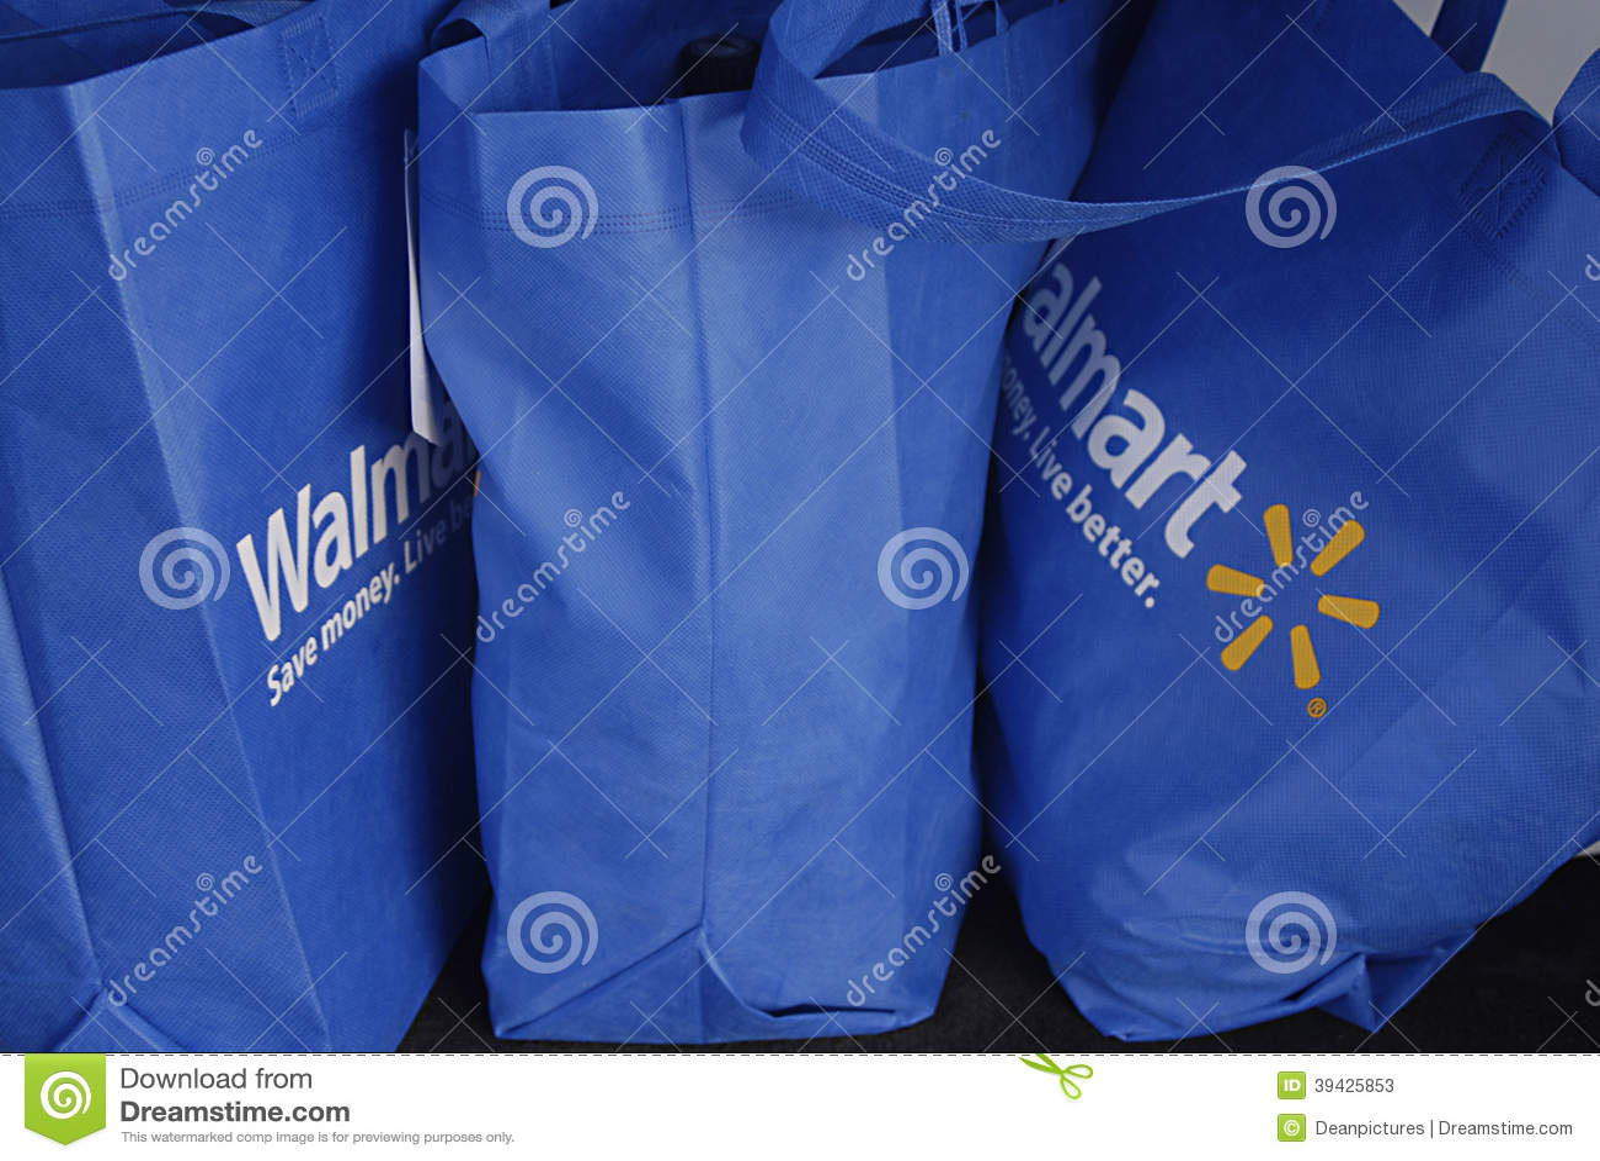 Hawaii Usa Walmart Shopping Bags Editorial Stock Photo